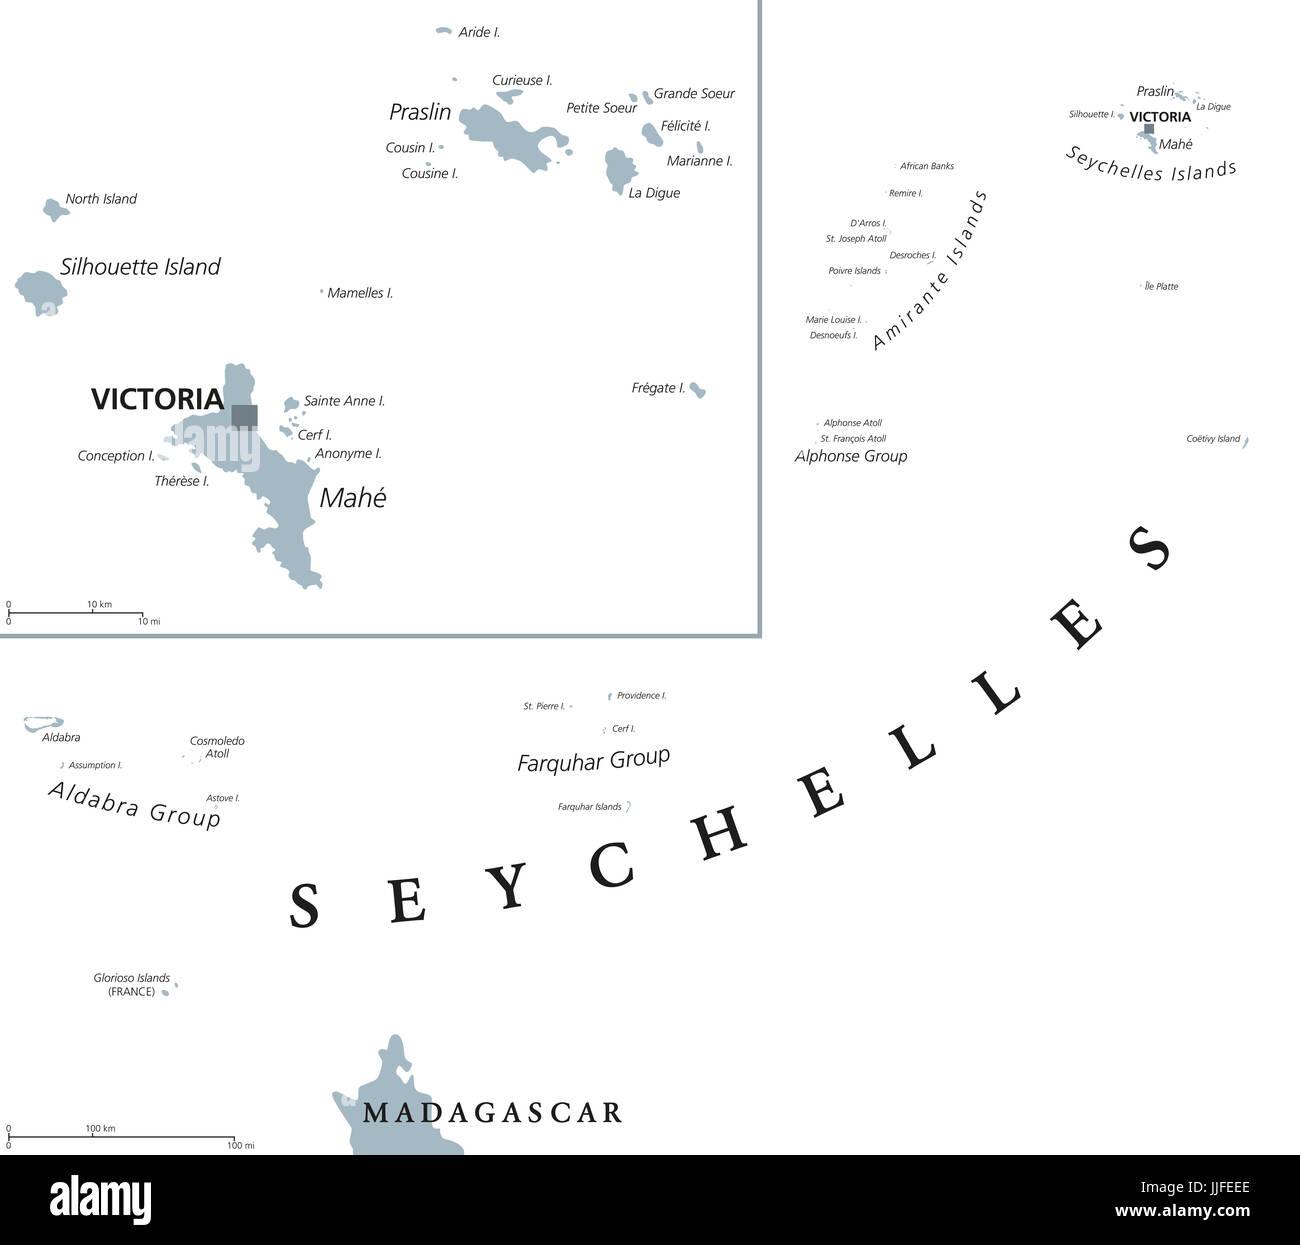 Alphonse Seychelles Imagenes De Stock Alphonse Seychelles